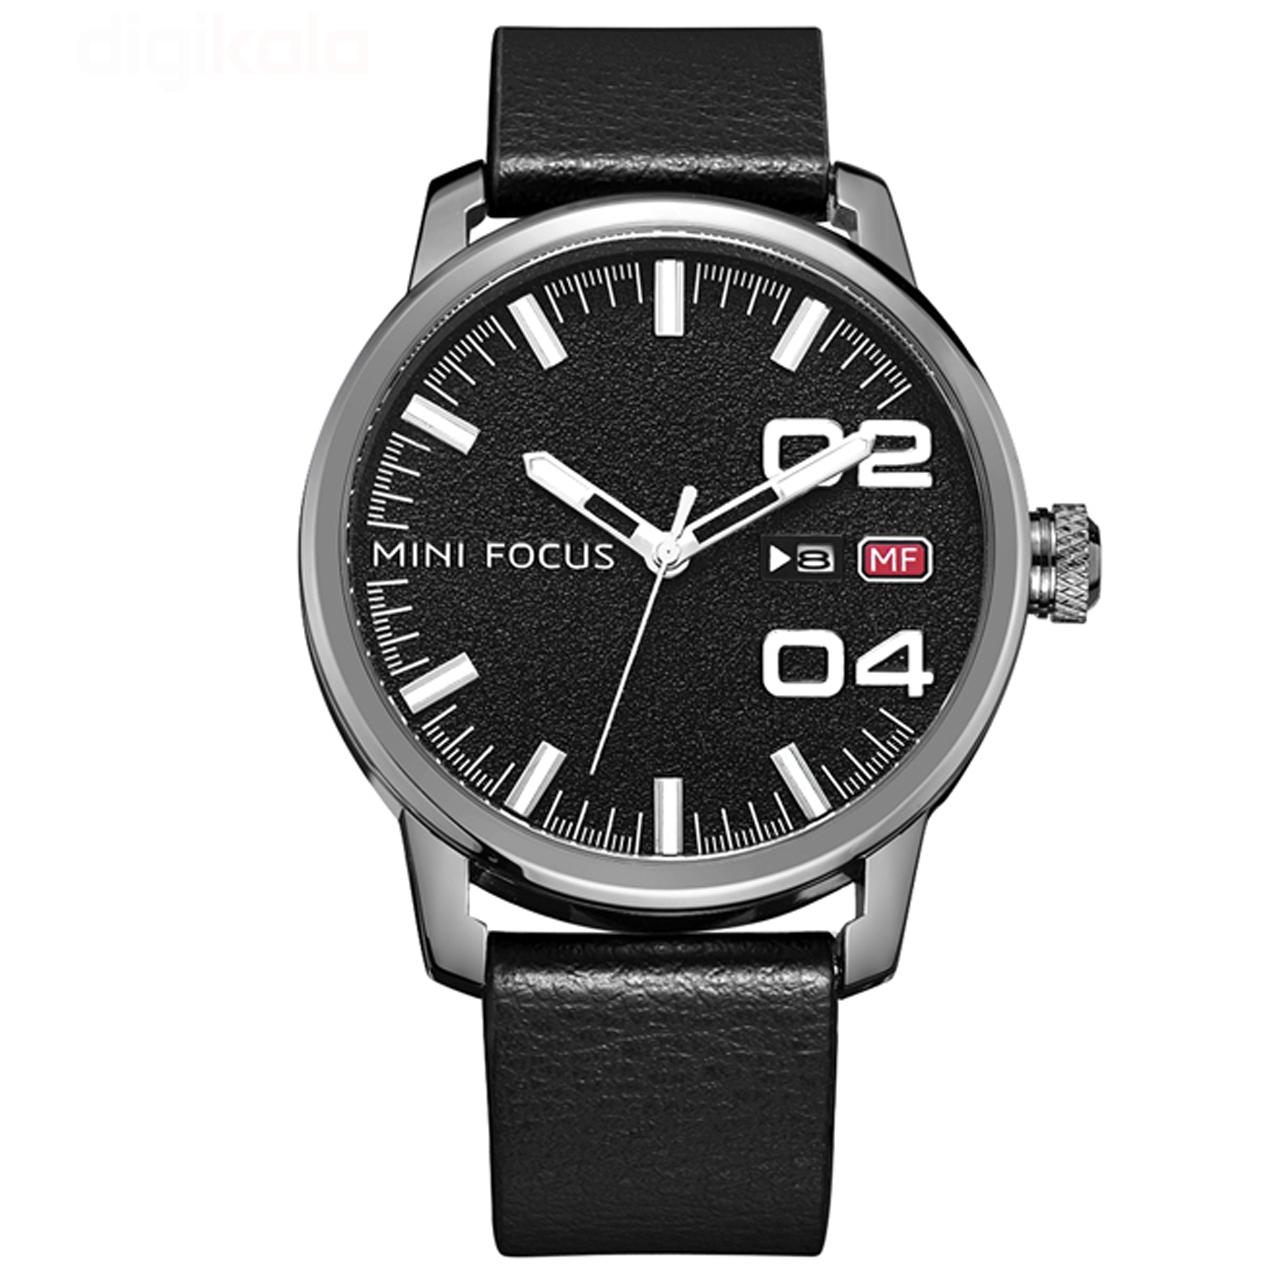 ساعت مچی عقربه ای مردانه مینی فوکوس mf0022g.01